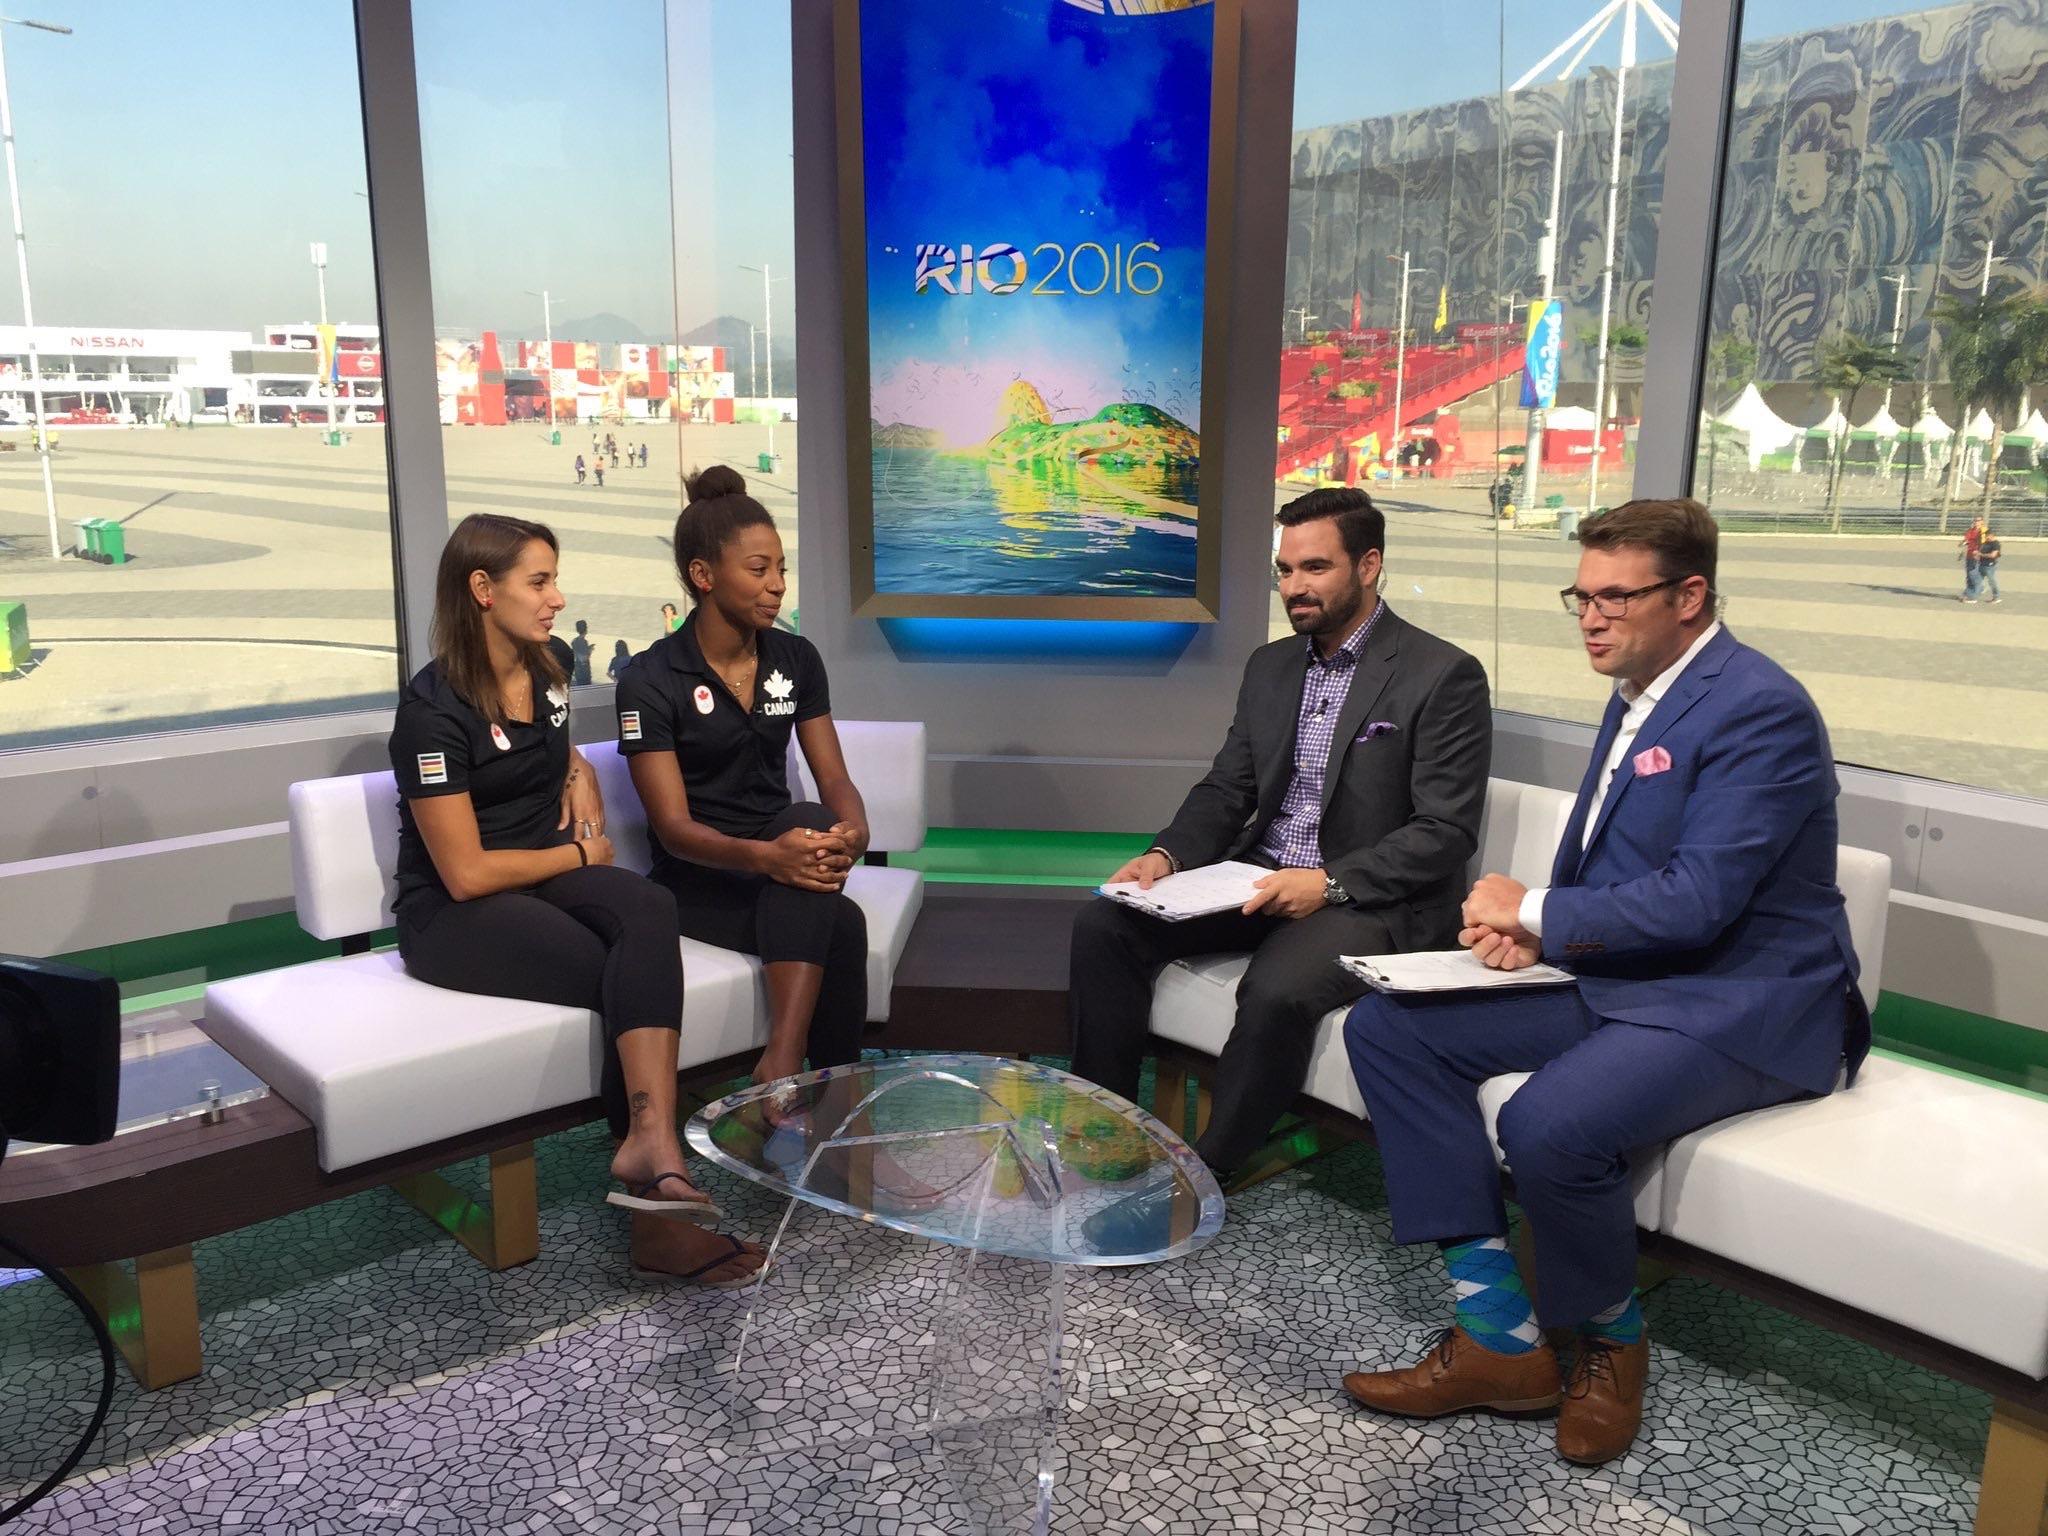 ncs_CBC-Rio-Olympics-TV-Studio_0005